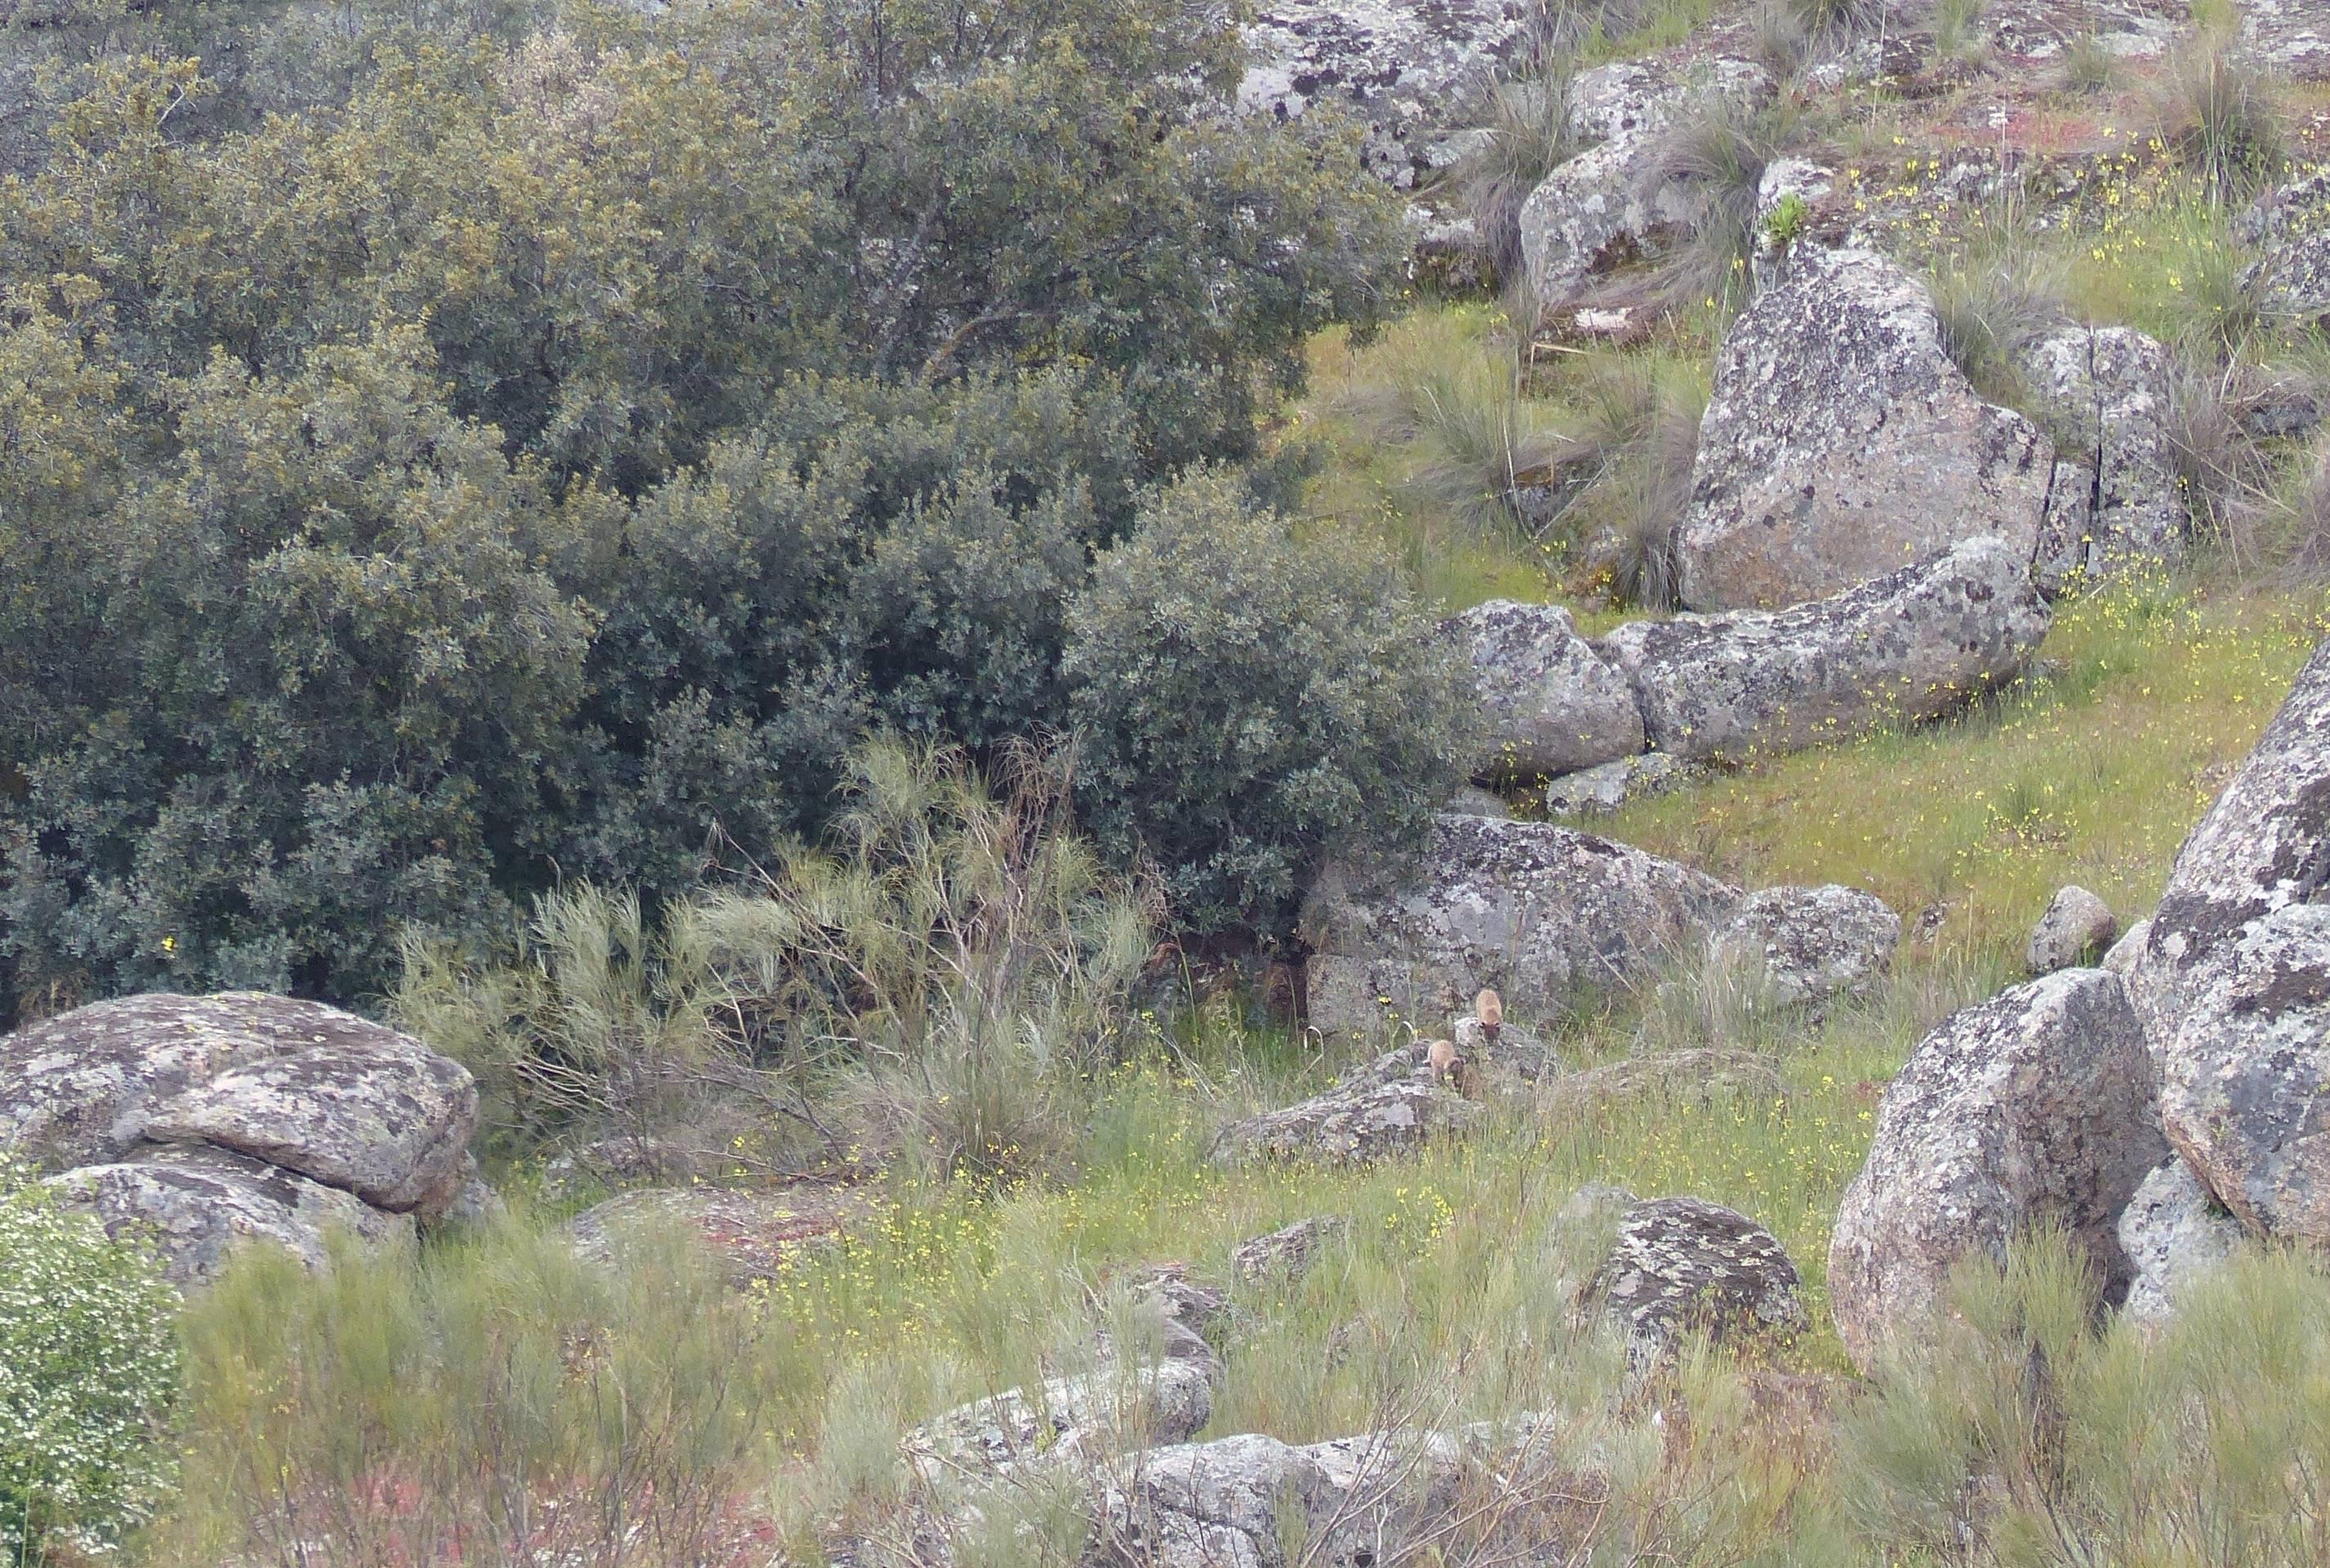 lince iberico libre en montes de toledo